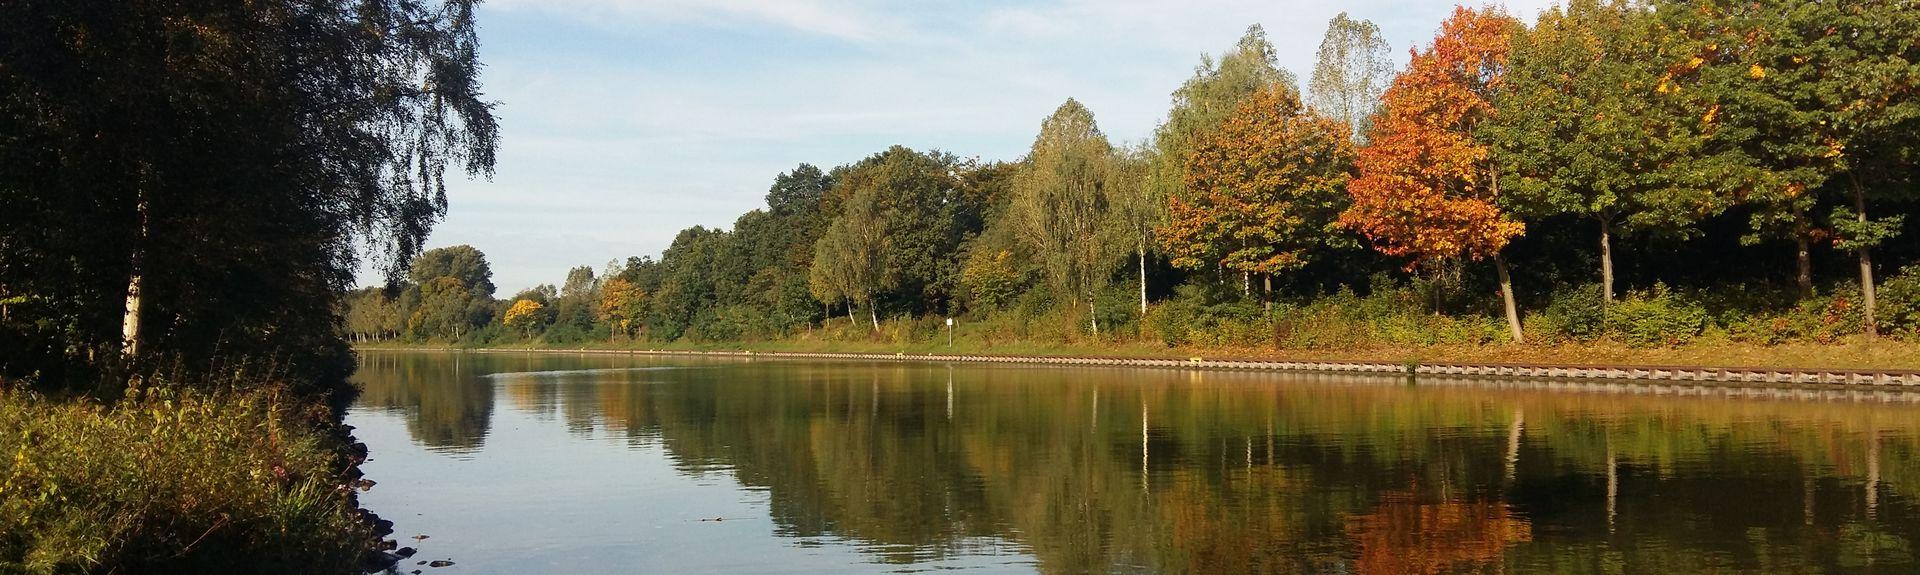 Hamminkeln, North Rhine-Westphalia, Germany